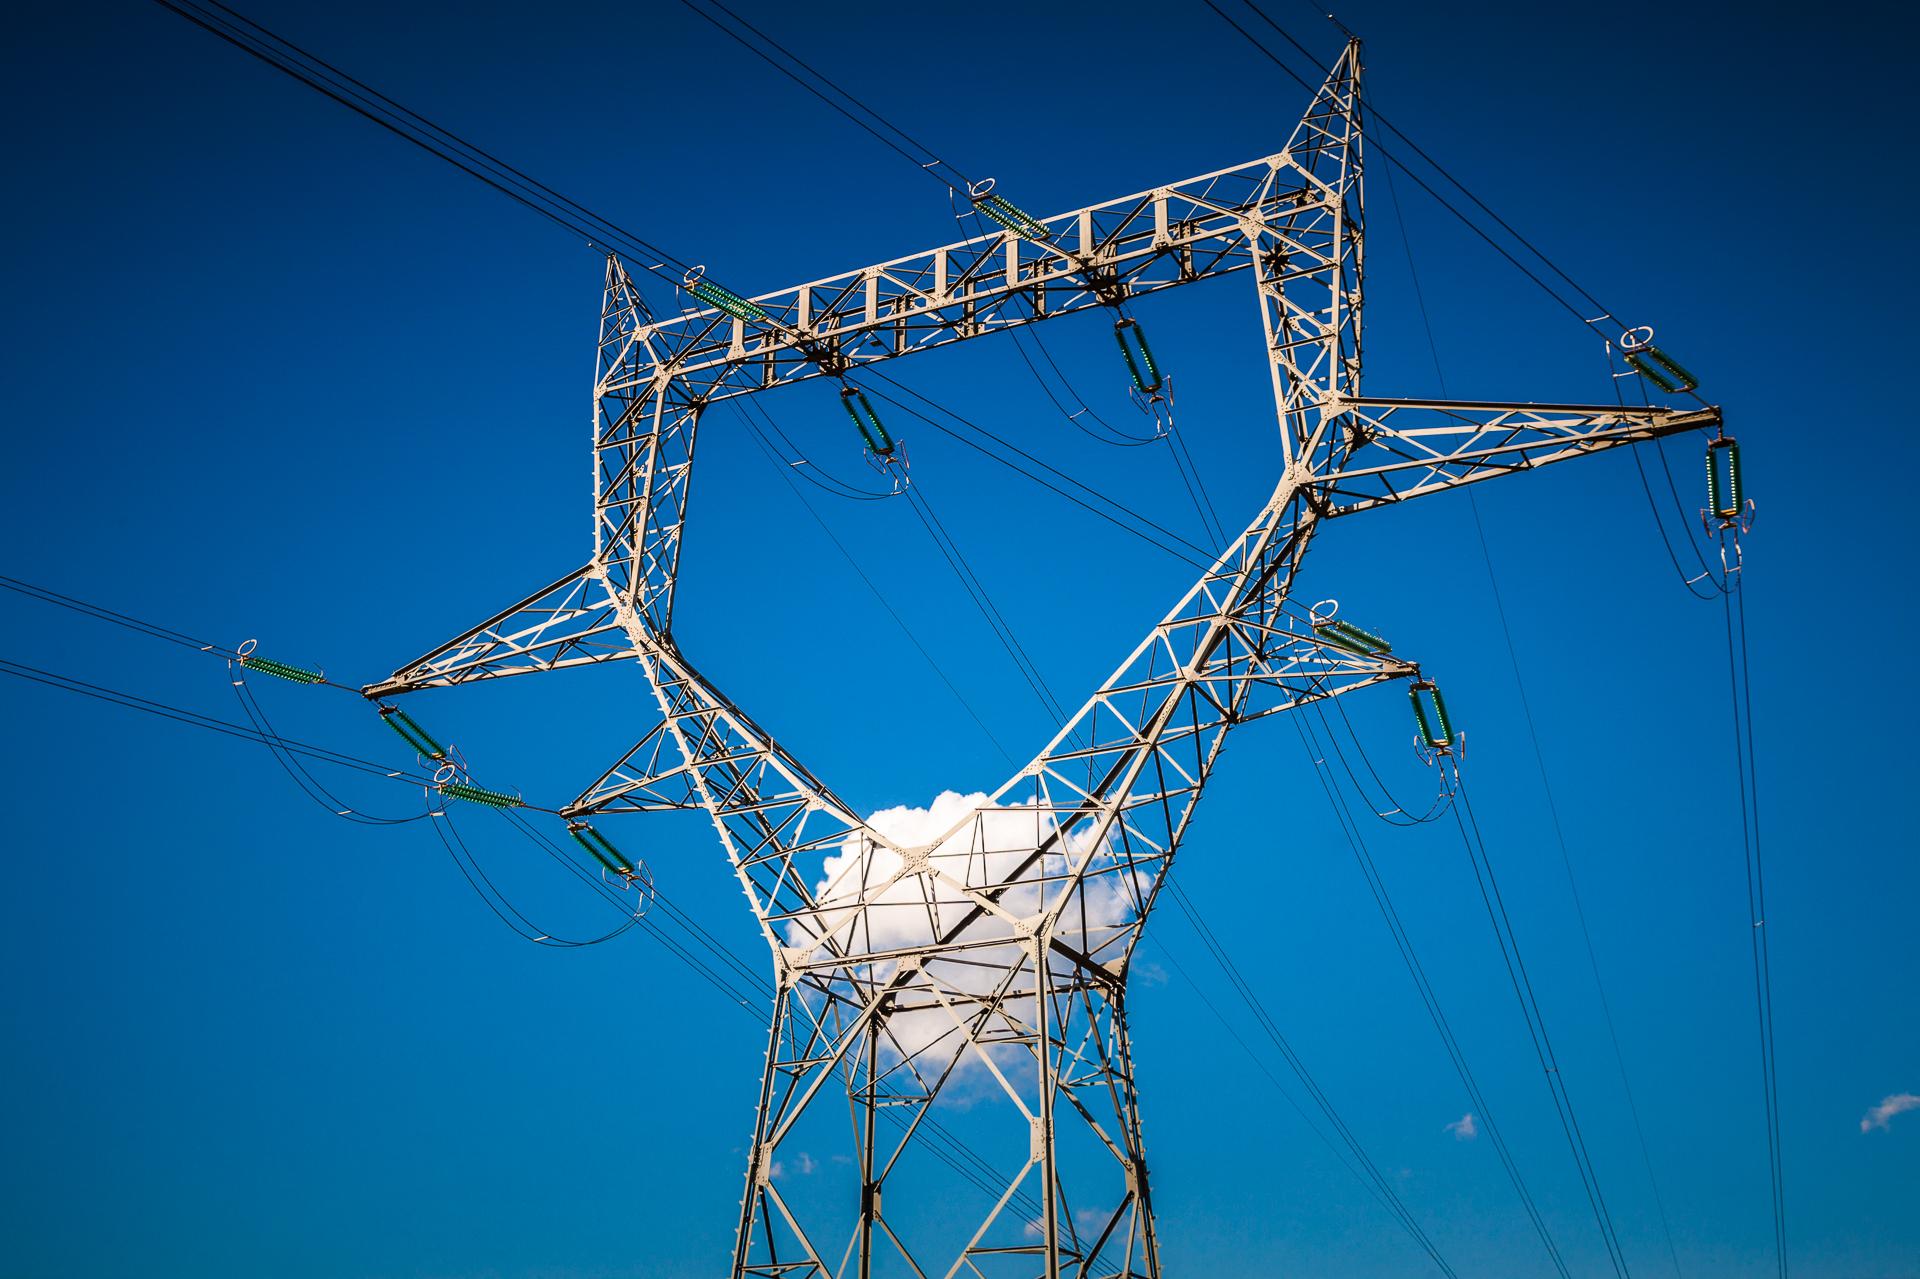 Nuage electrique